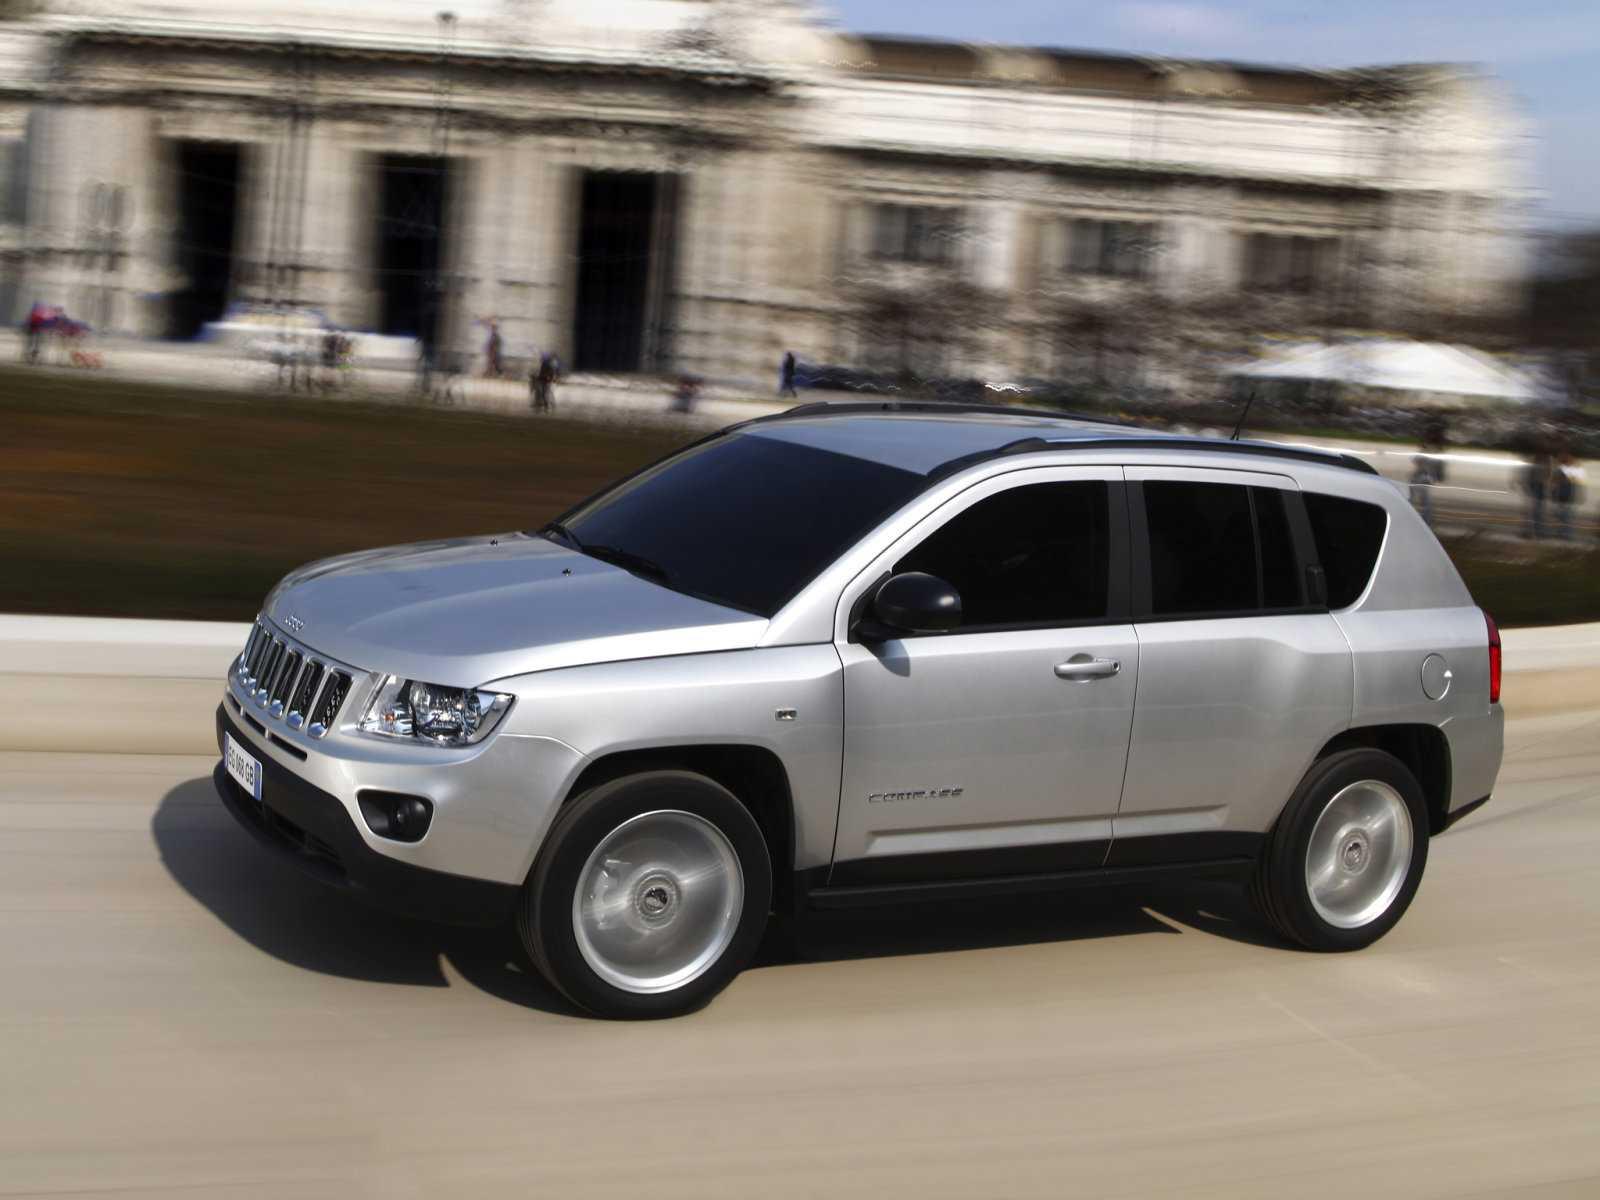 Первый jeep compass (2006-2016) цена, технические характеристики, фото, видео тест-драйв